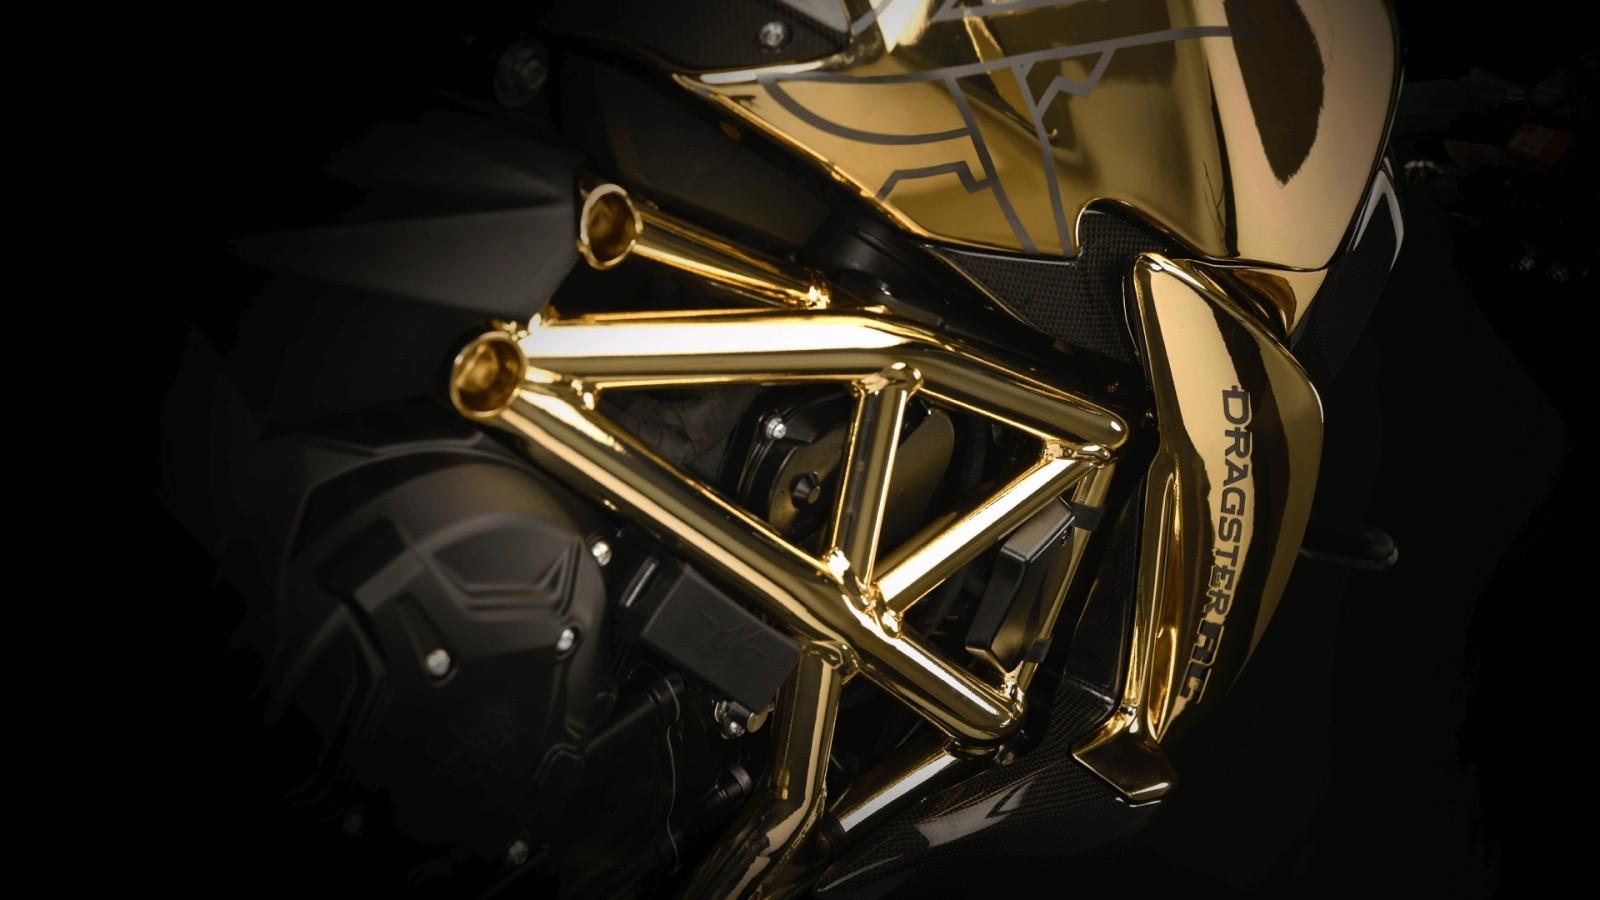 Foto de MV Agusta Dragster RC Shining Gold 2019 (7/14)